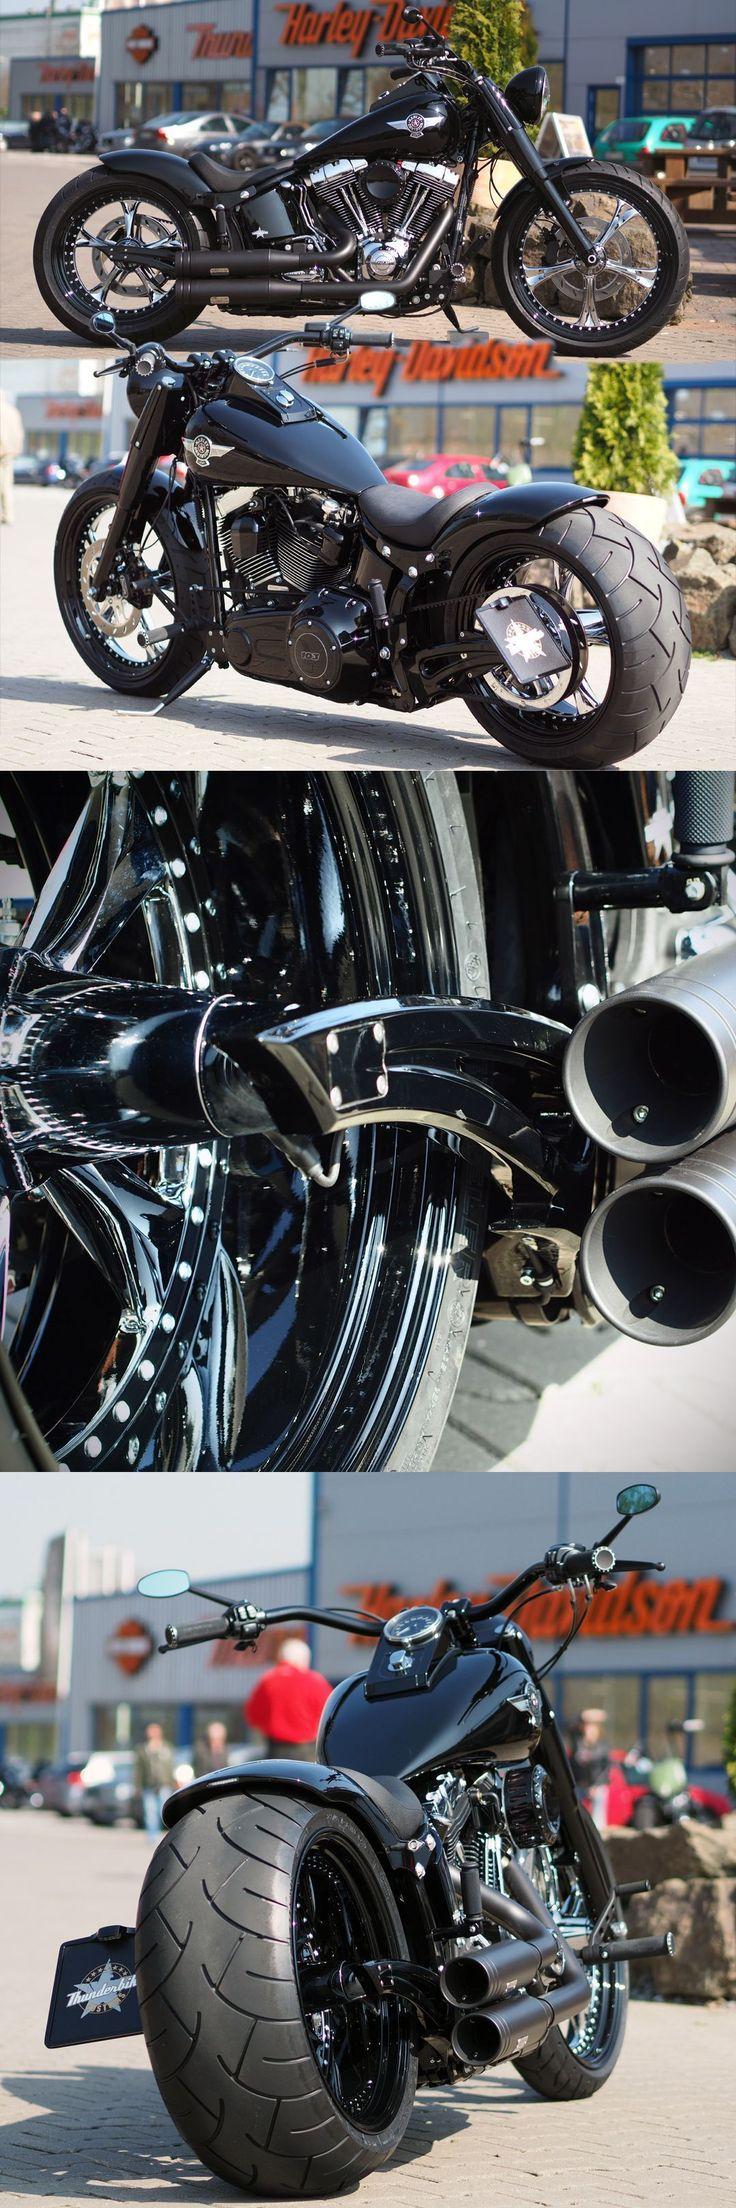 Thunderbike customized Harley-Davidson Fat Boy So dope ! #harleydavidsongirlspictures #harleydavidsonbikes #harleydavidsonchoppersawesome